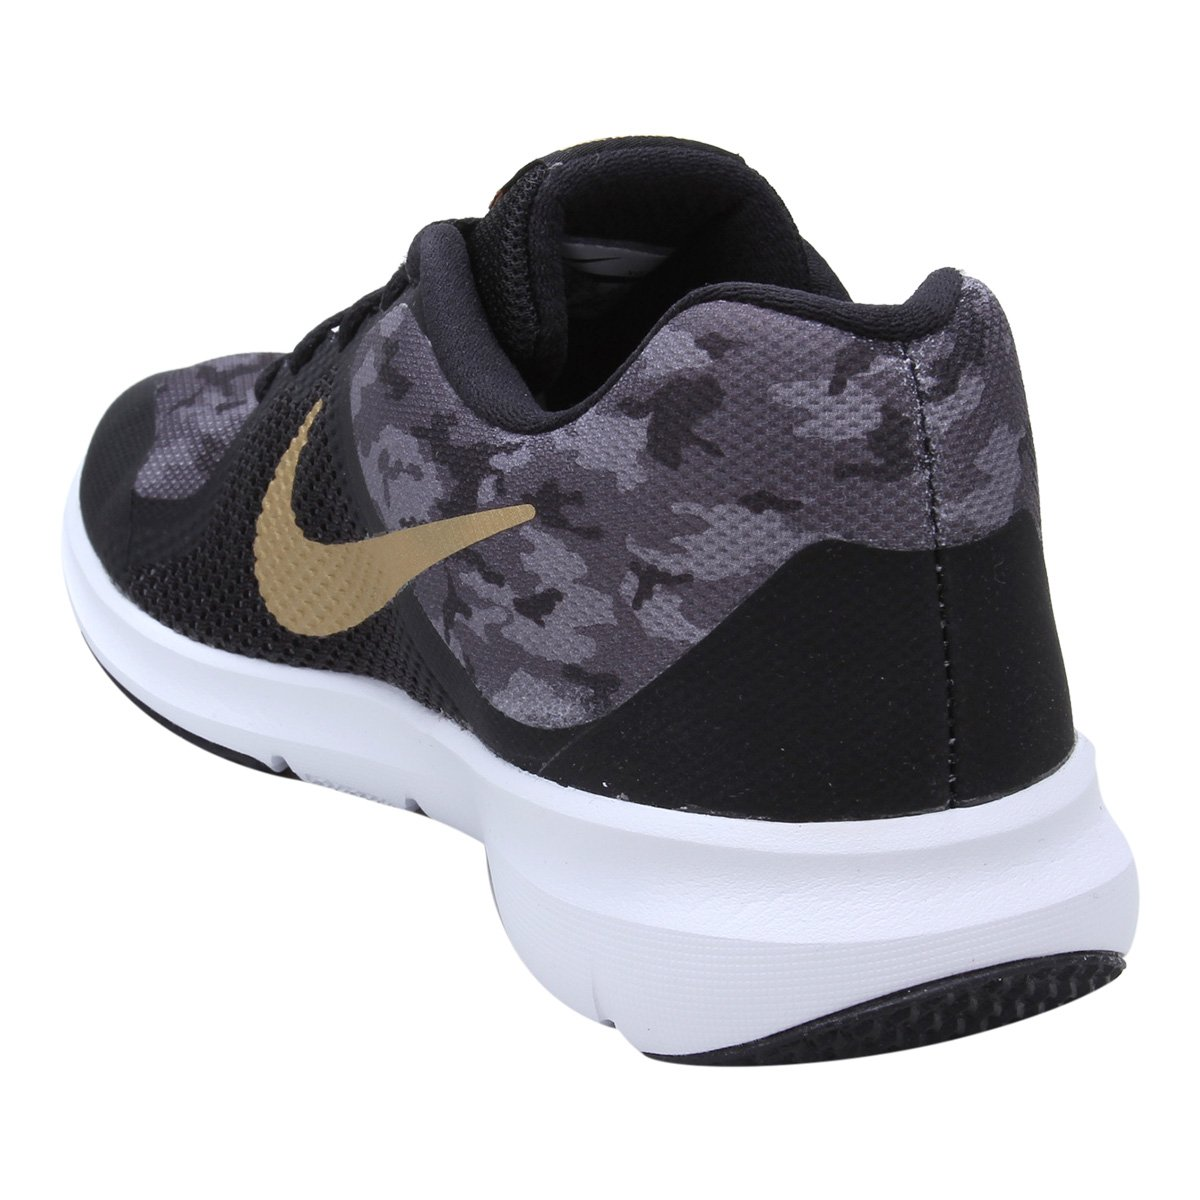 900bb0167a0e2 Tênis Nike Flex Control Sp Masculino - Shopping TudoAzul